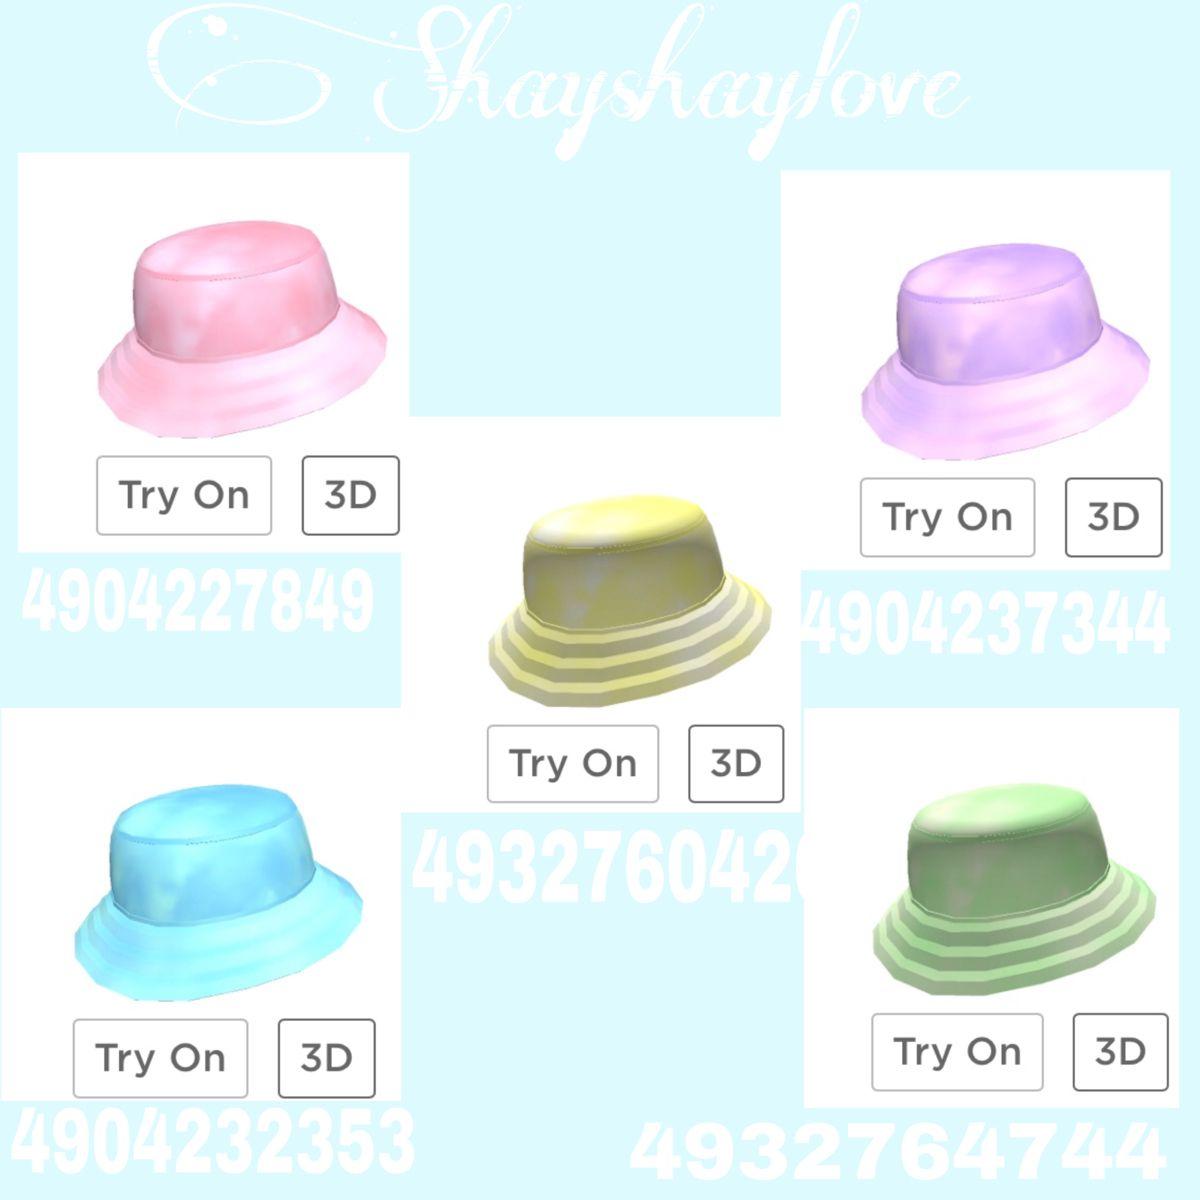 Try Any Hat Roblox Pin By Alexandra Gallardo On Roblox In 2020 Roblox Codes Roblox Roblox Pictures